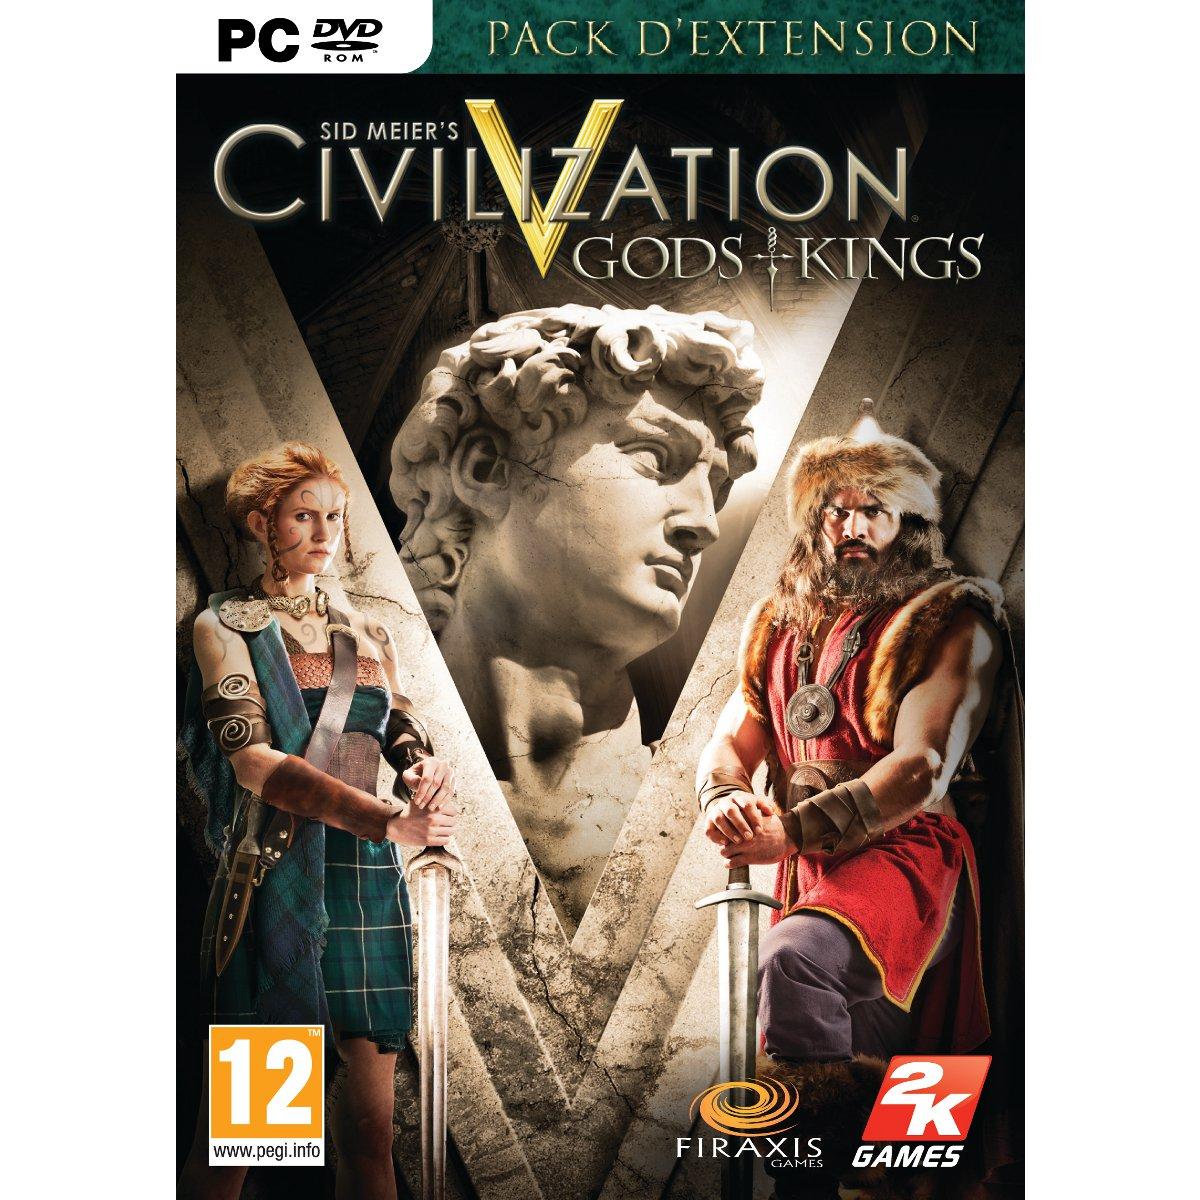 Jeux PC Sid Meier's Civilization V - Gods & Kings (PC) Sid Meier's Civilization V - Gods & Kings (PC)